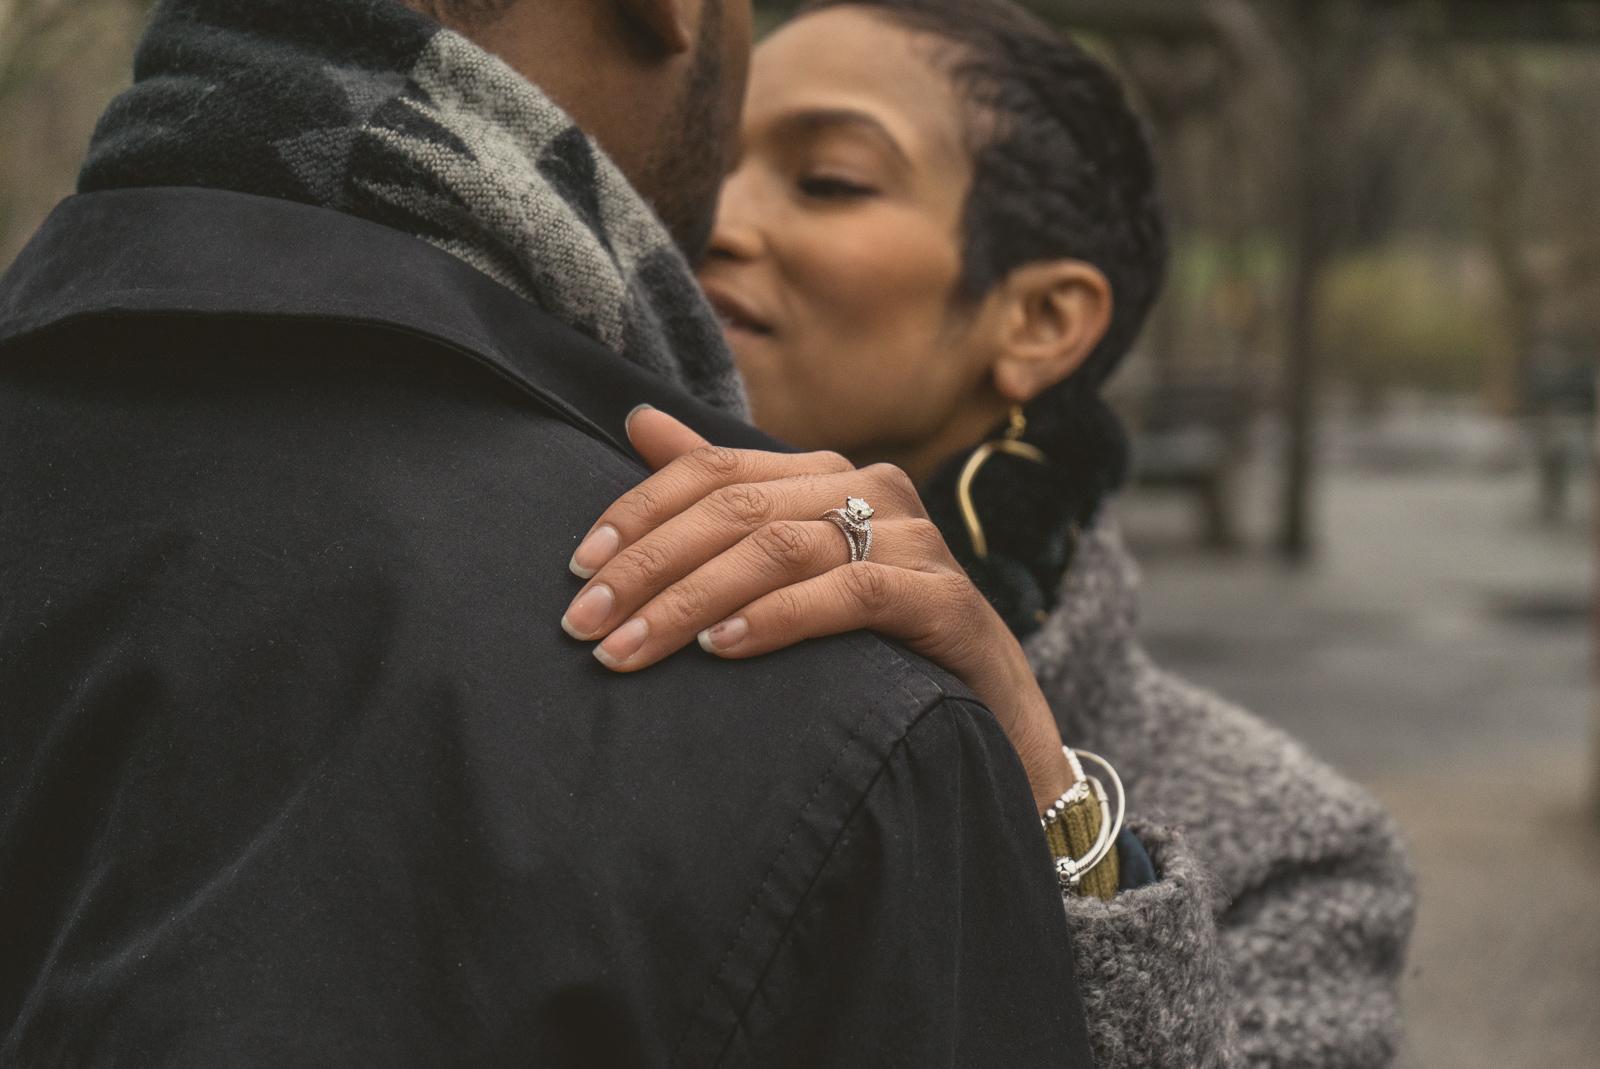 Photo 16 Pine Bank bridge Central Park Marriage Proposal   VladLeto